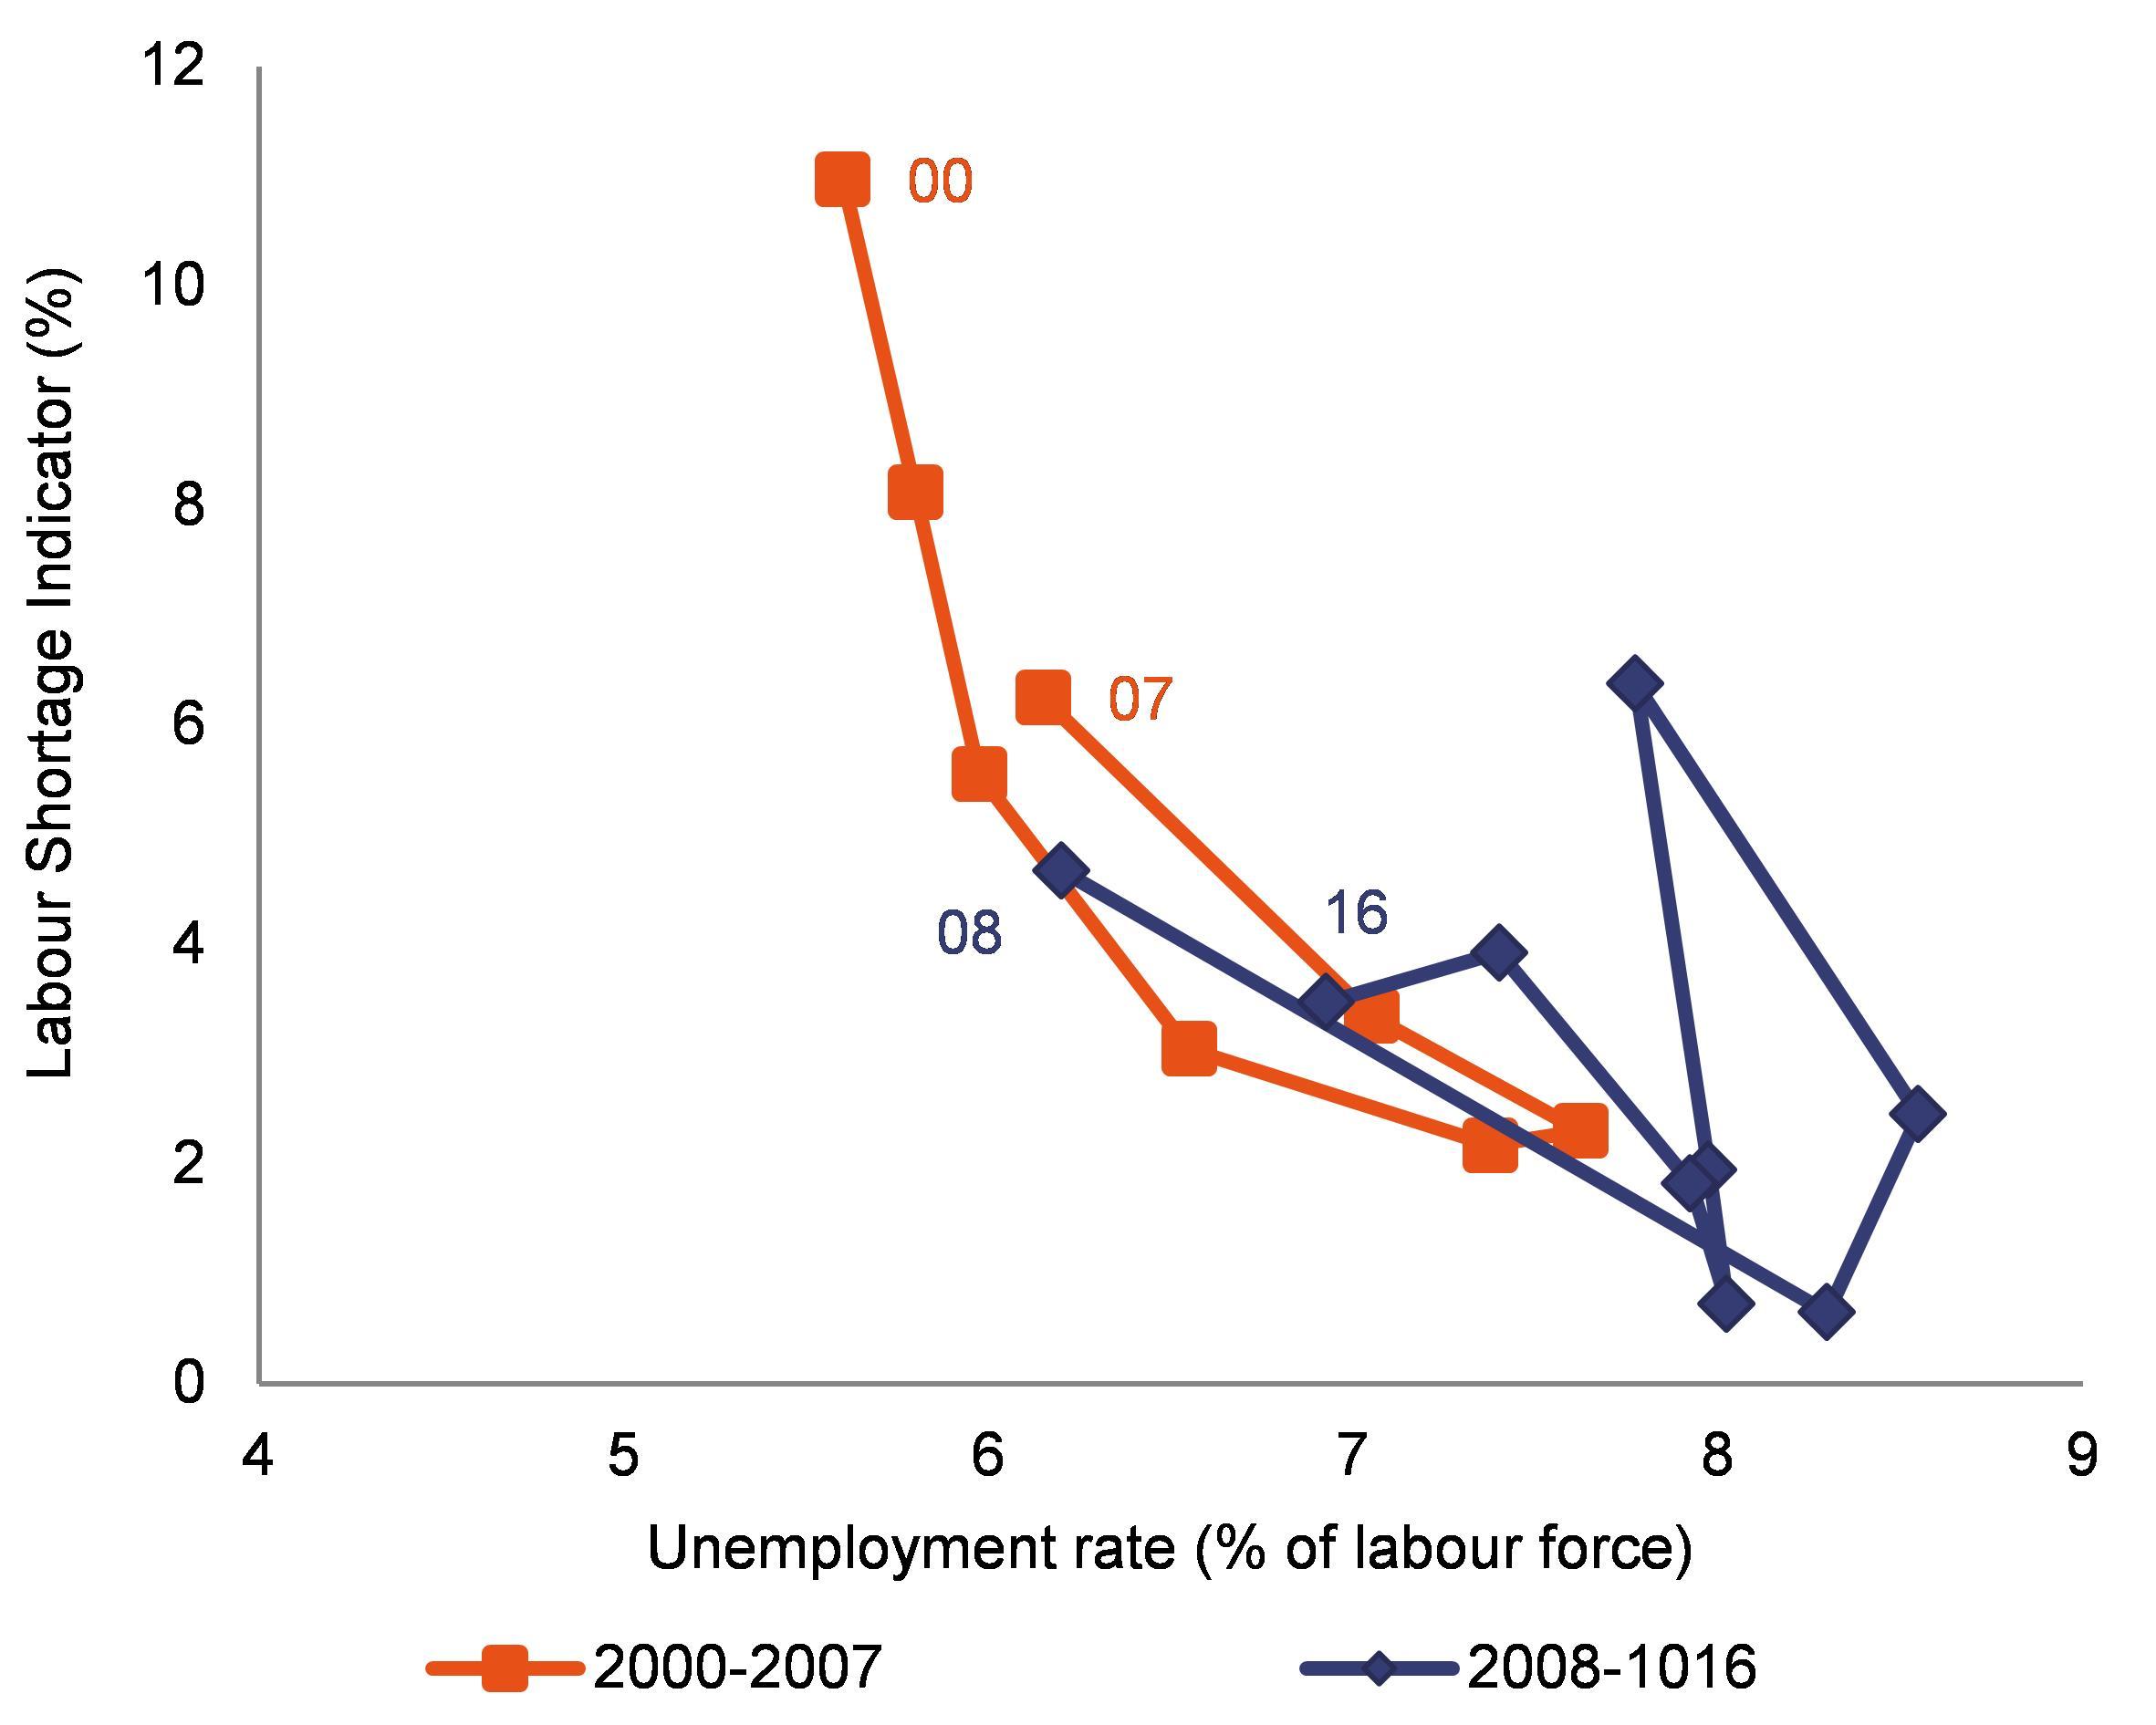 Eur lex 52018sc0225 en eur lex note the graph shows the relationship between the labour shortage indicator and the unemployment rate labour shortage indicator derived from eu business ccuart Images